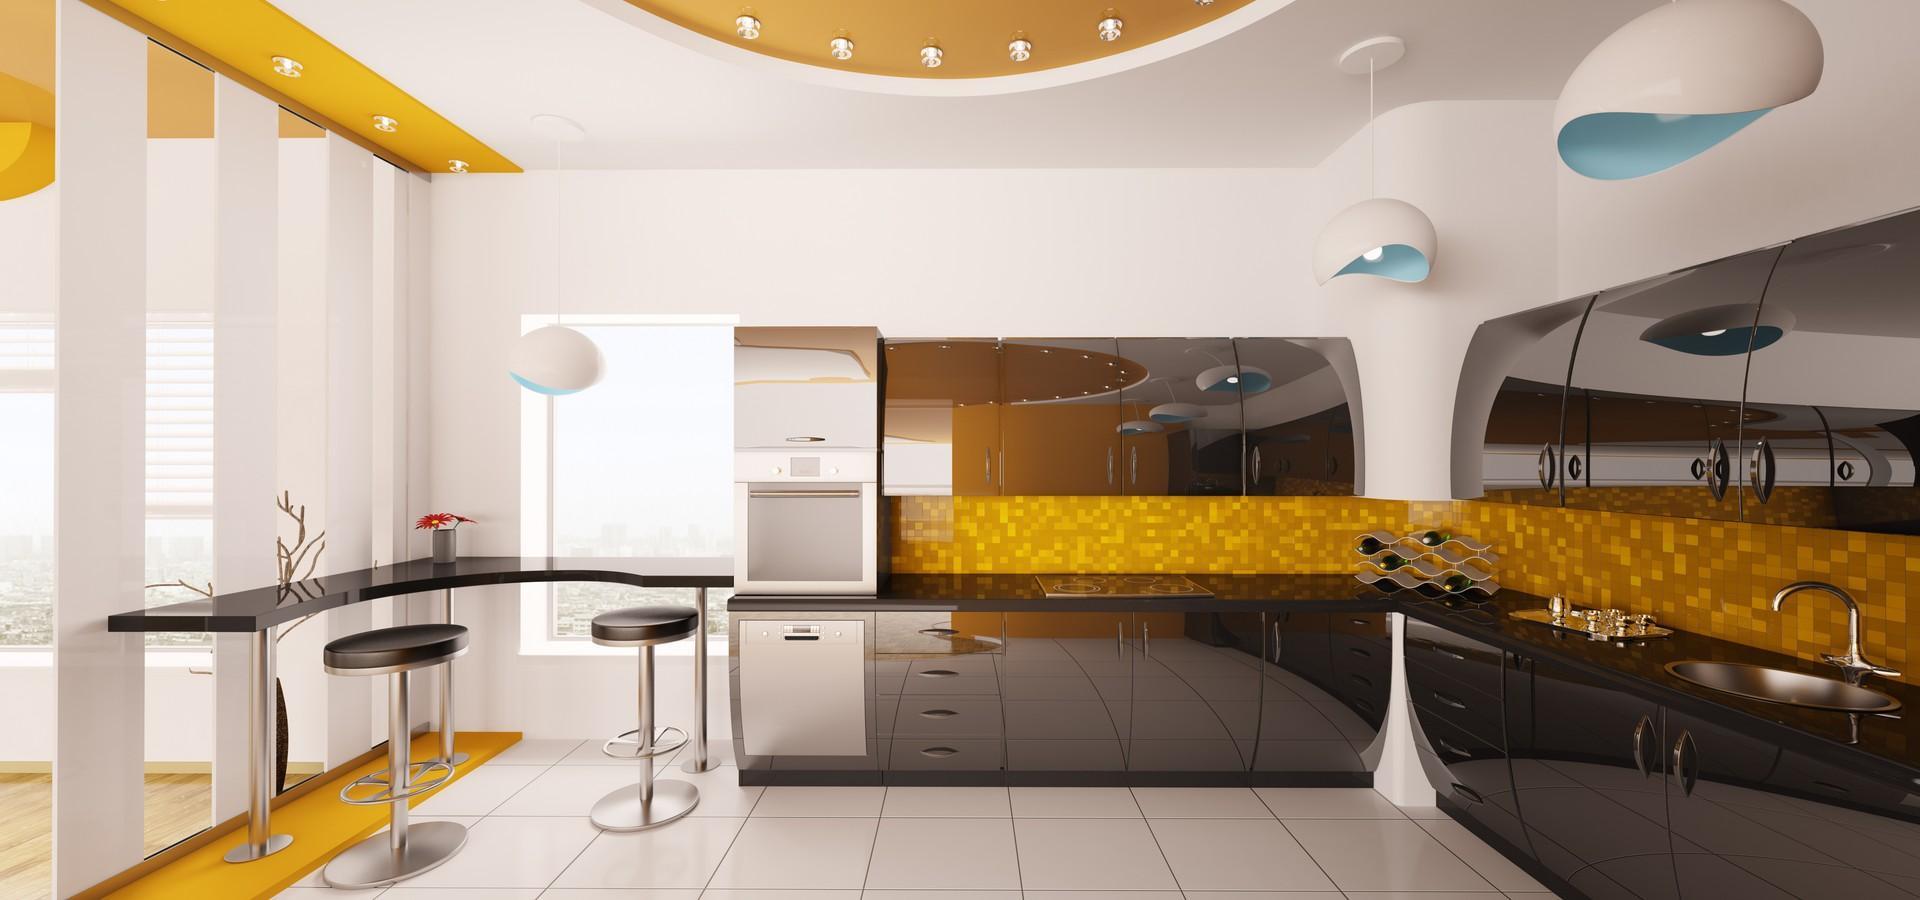 Желтый цвет на кухне в стиле техно